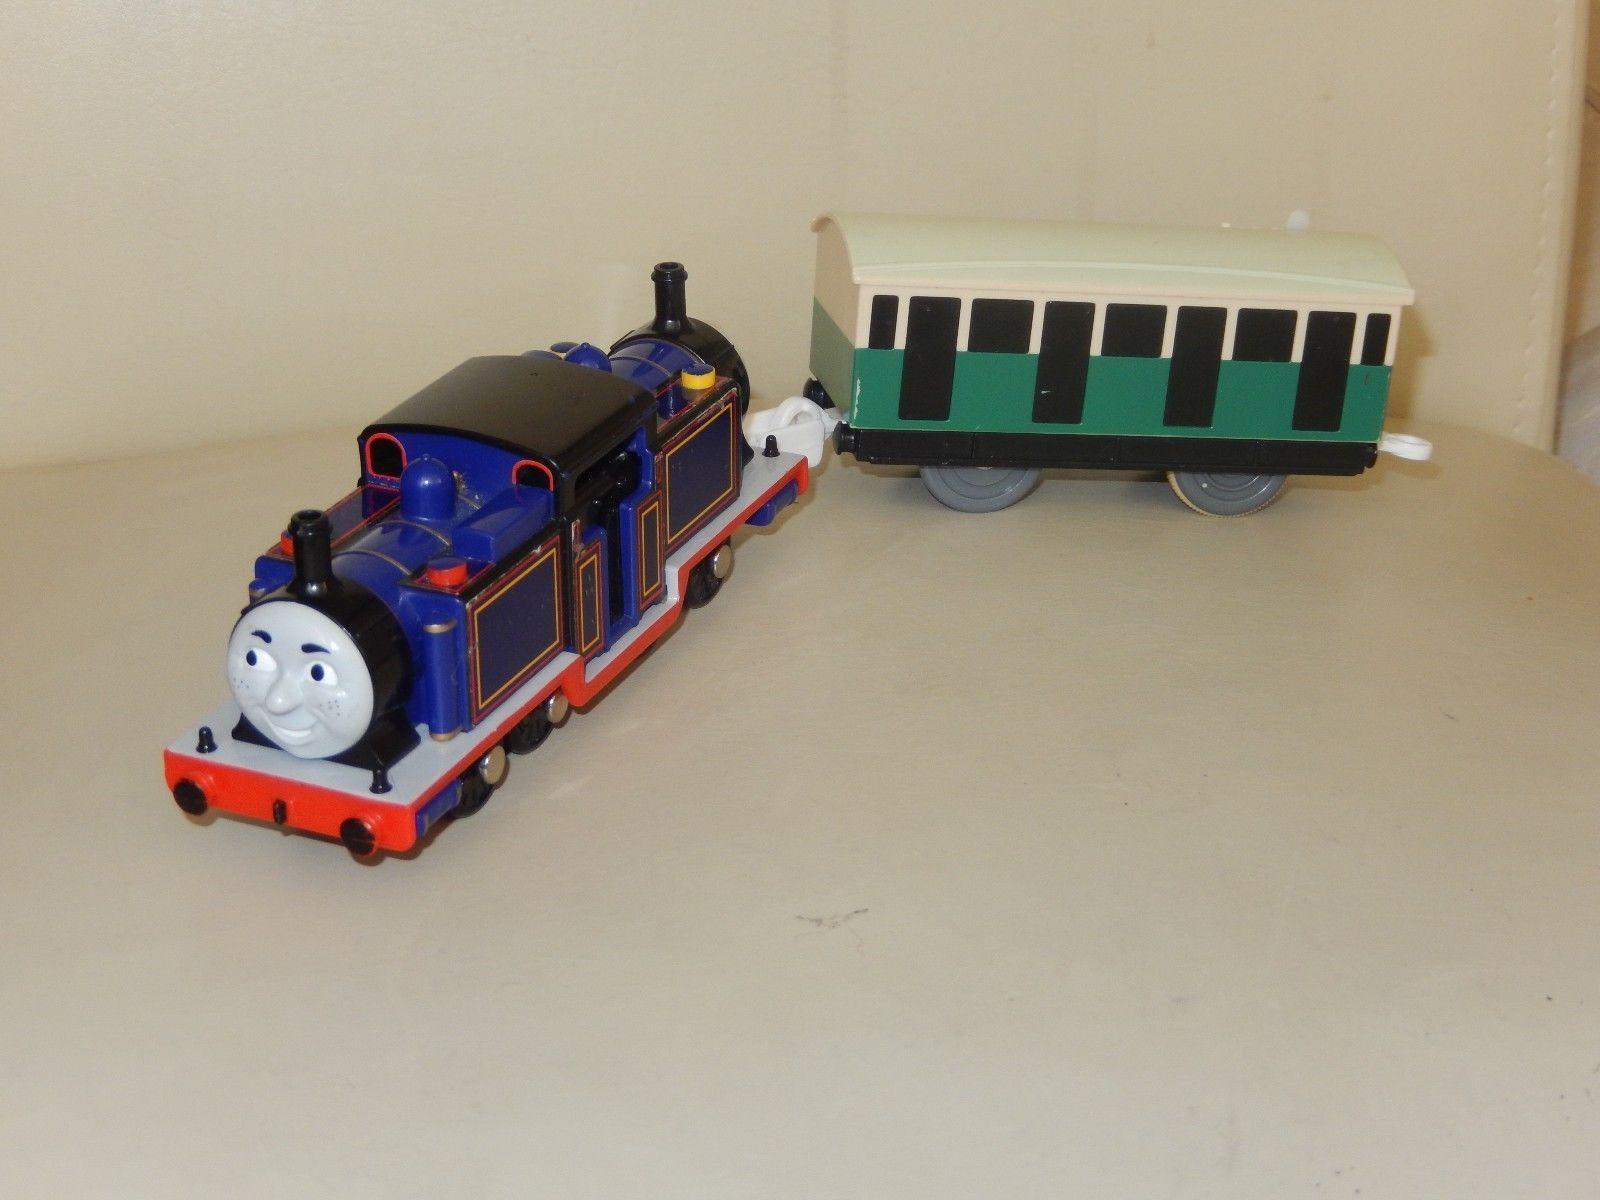 Thomas the tank engine wallpaper border - Tomy Trackmaster Thomas The Tank Engine Battery Train Mighty Mac